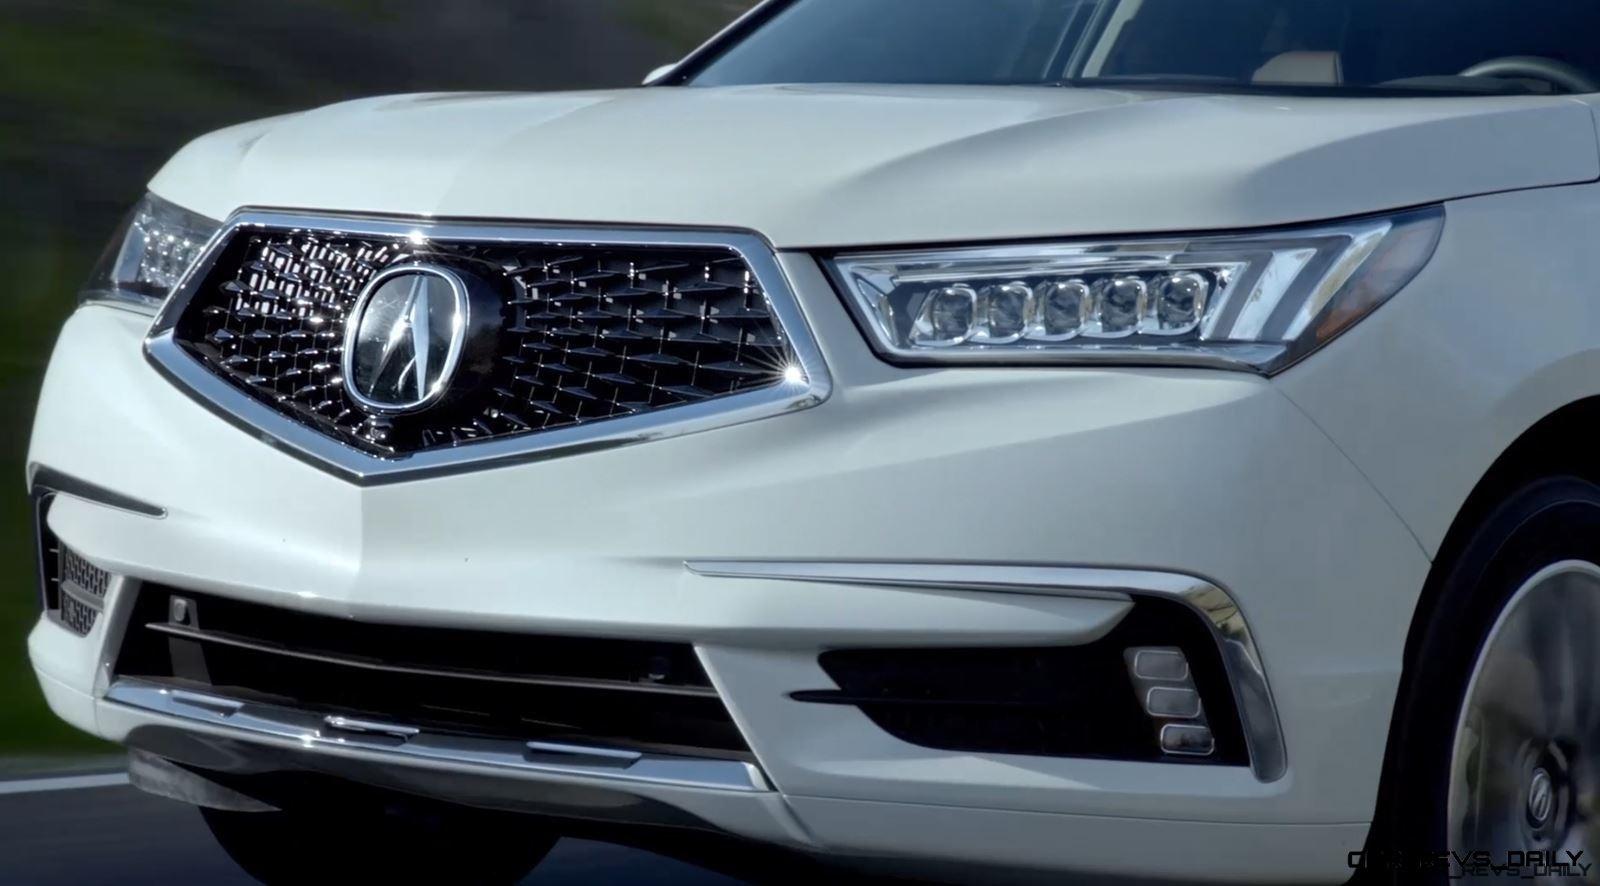 Acura MDX Sport Hybrid Leads Updated Range Images - 2018 acura rdx headlights